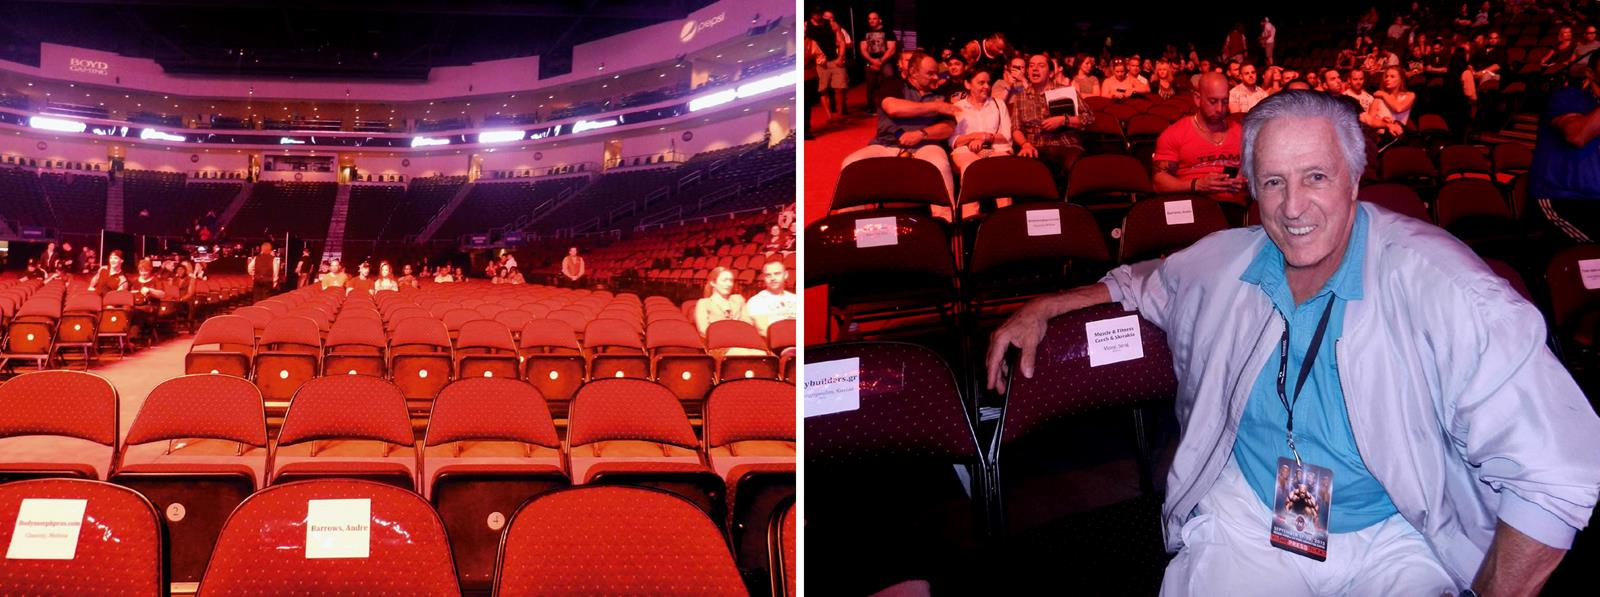 Hladisko Orleans Arena LV Olympia 2015